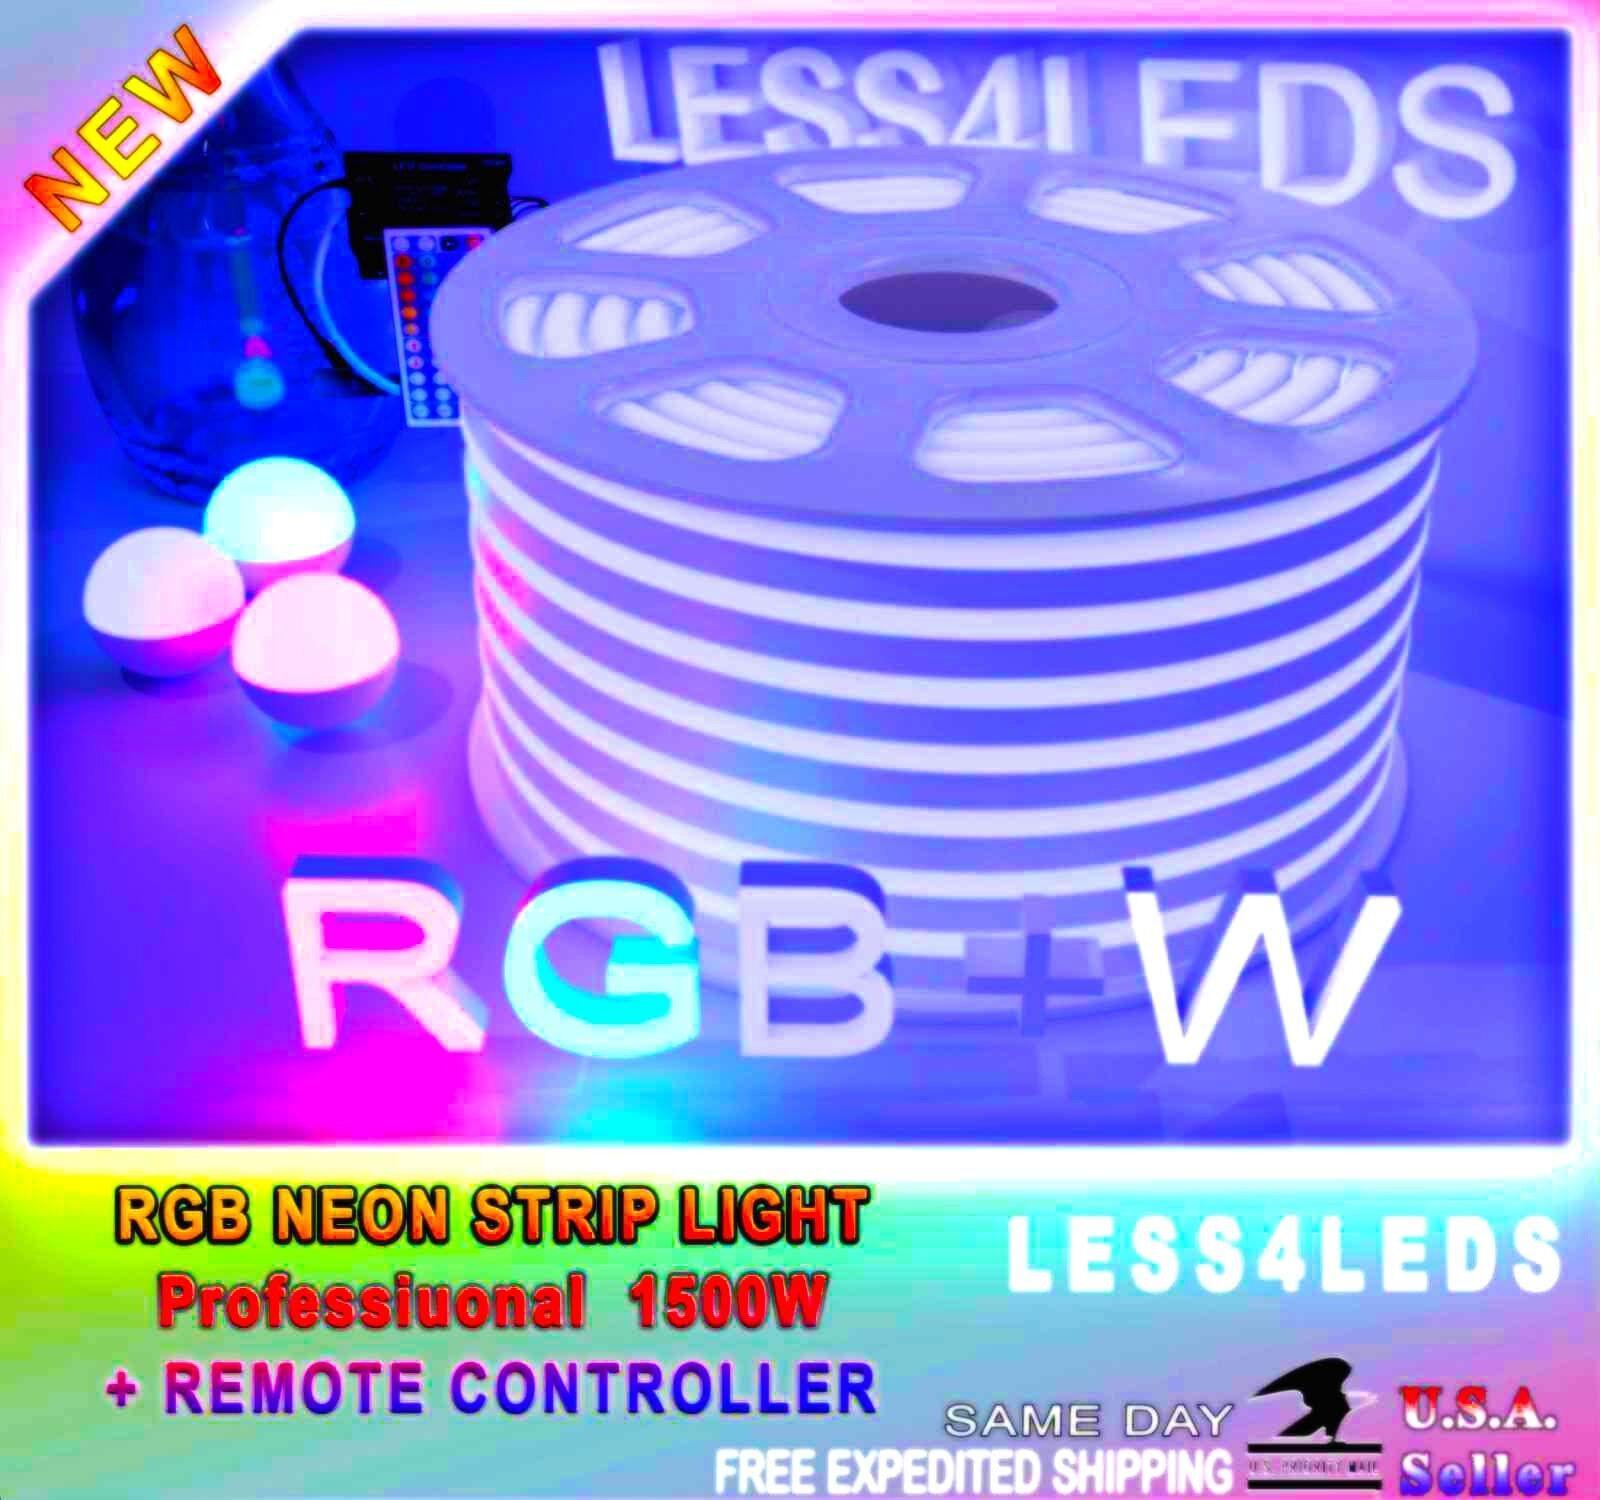 110V  RGB Neon Rope LED Strip Light RGB +W Outdoor flexible